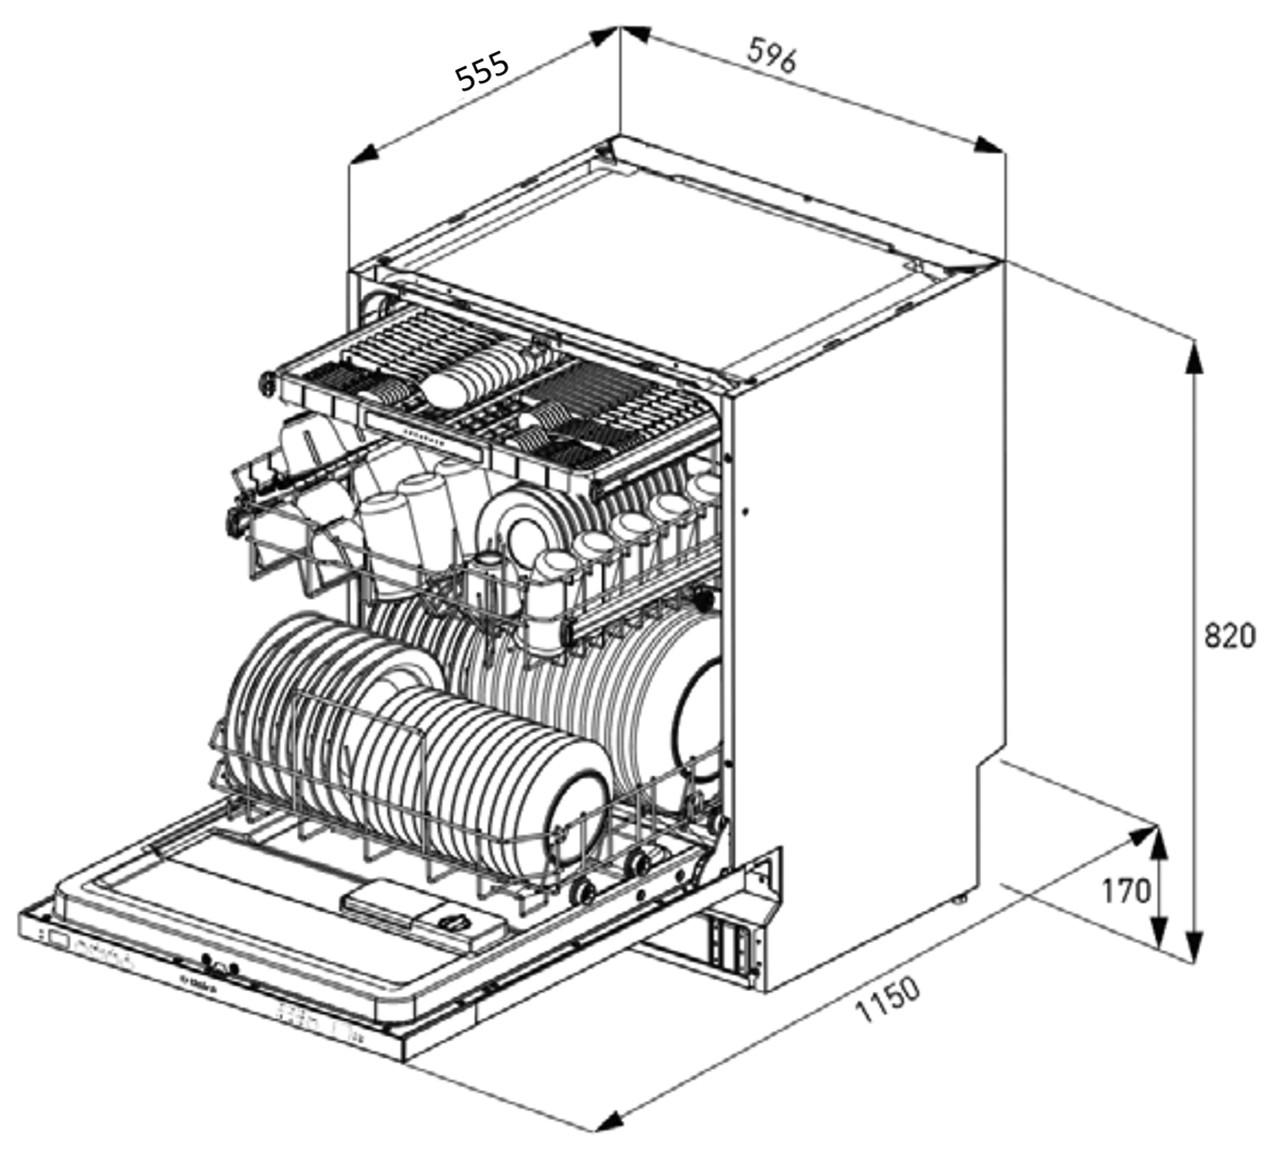 Dishwasher Drawing At Getdrawings